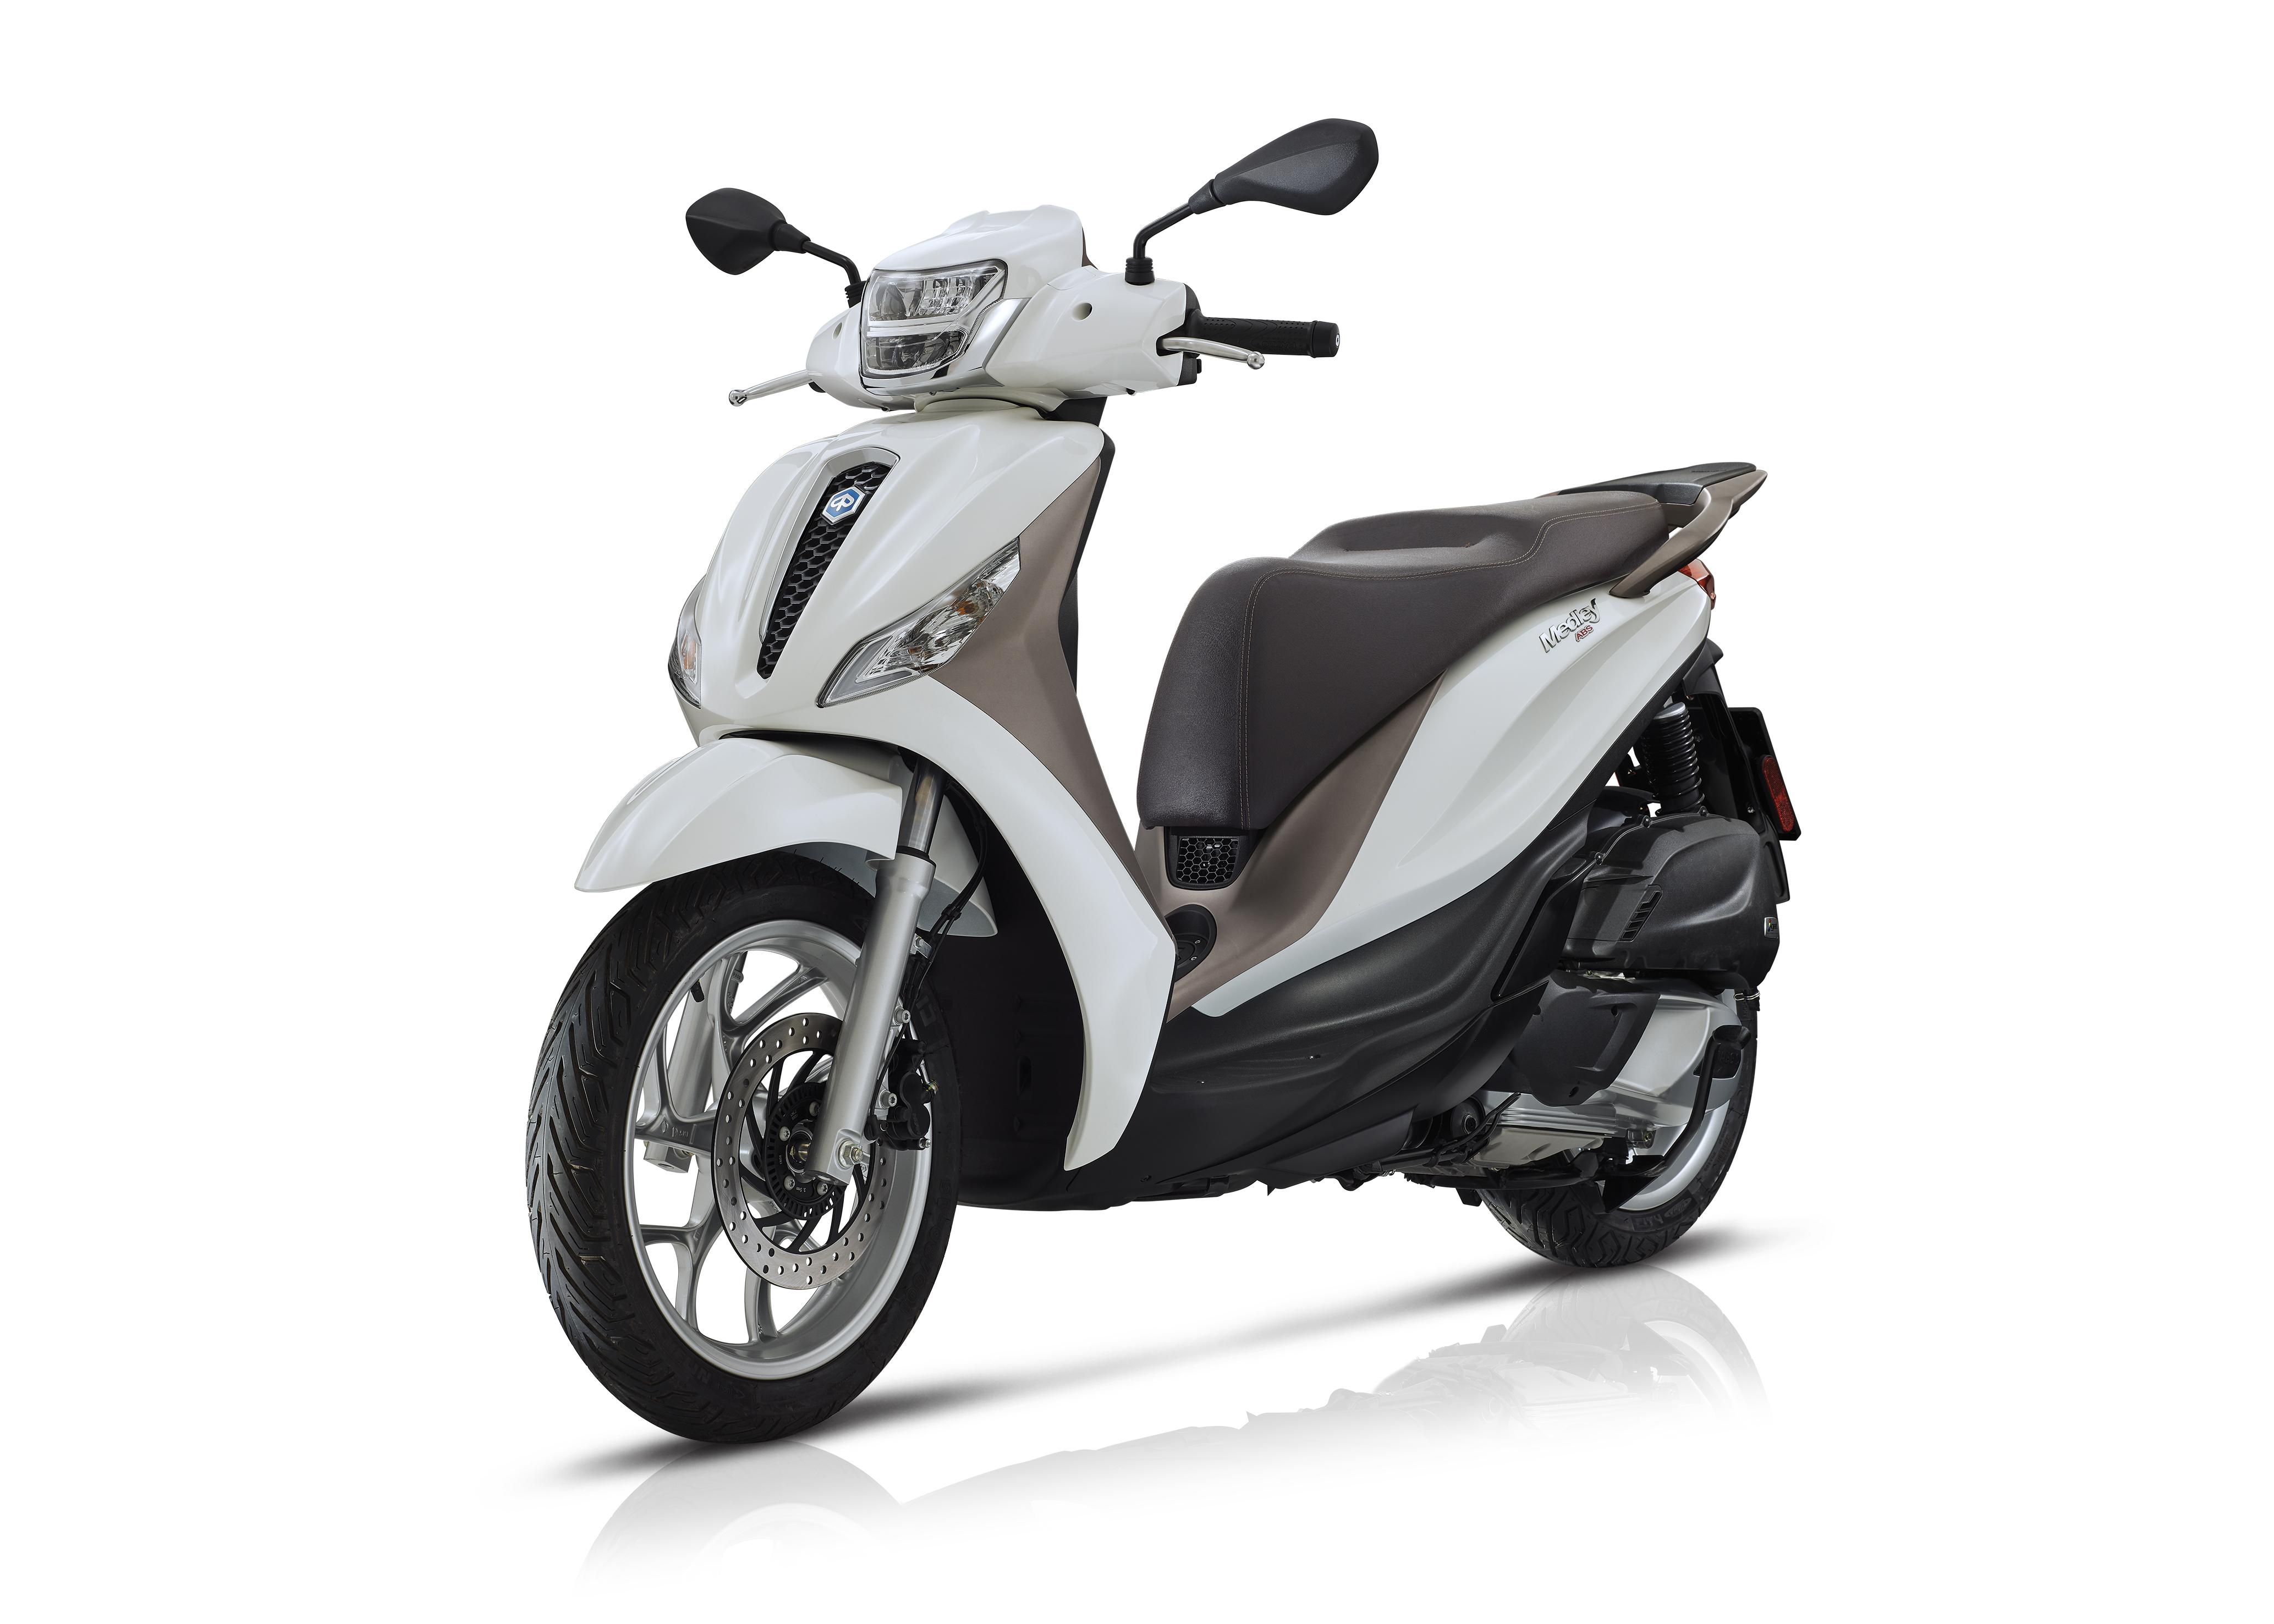 Piaggio Piaggio Medley 125 LED ABS